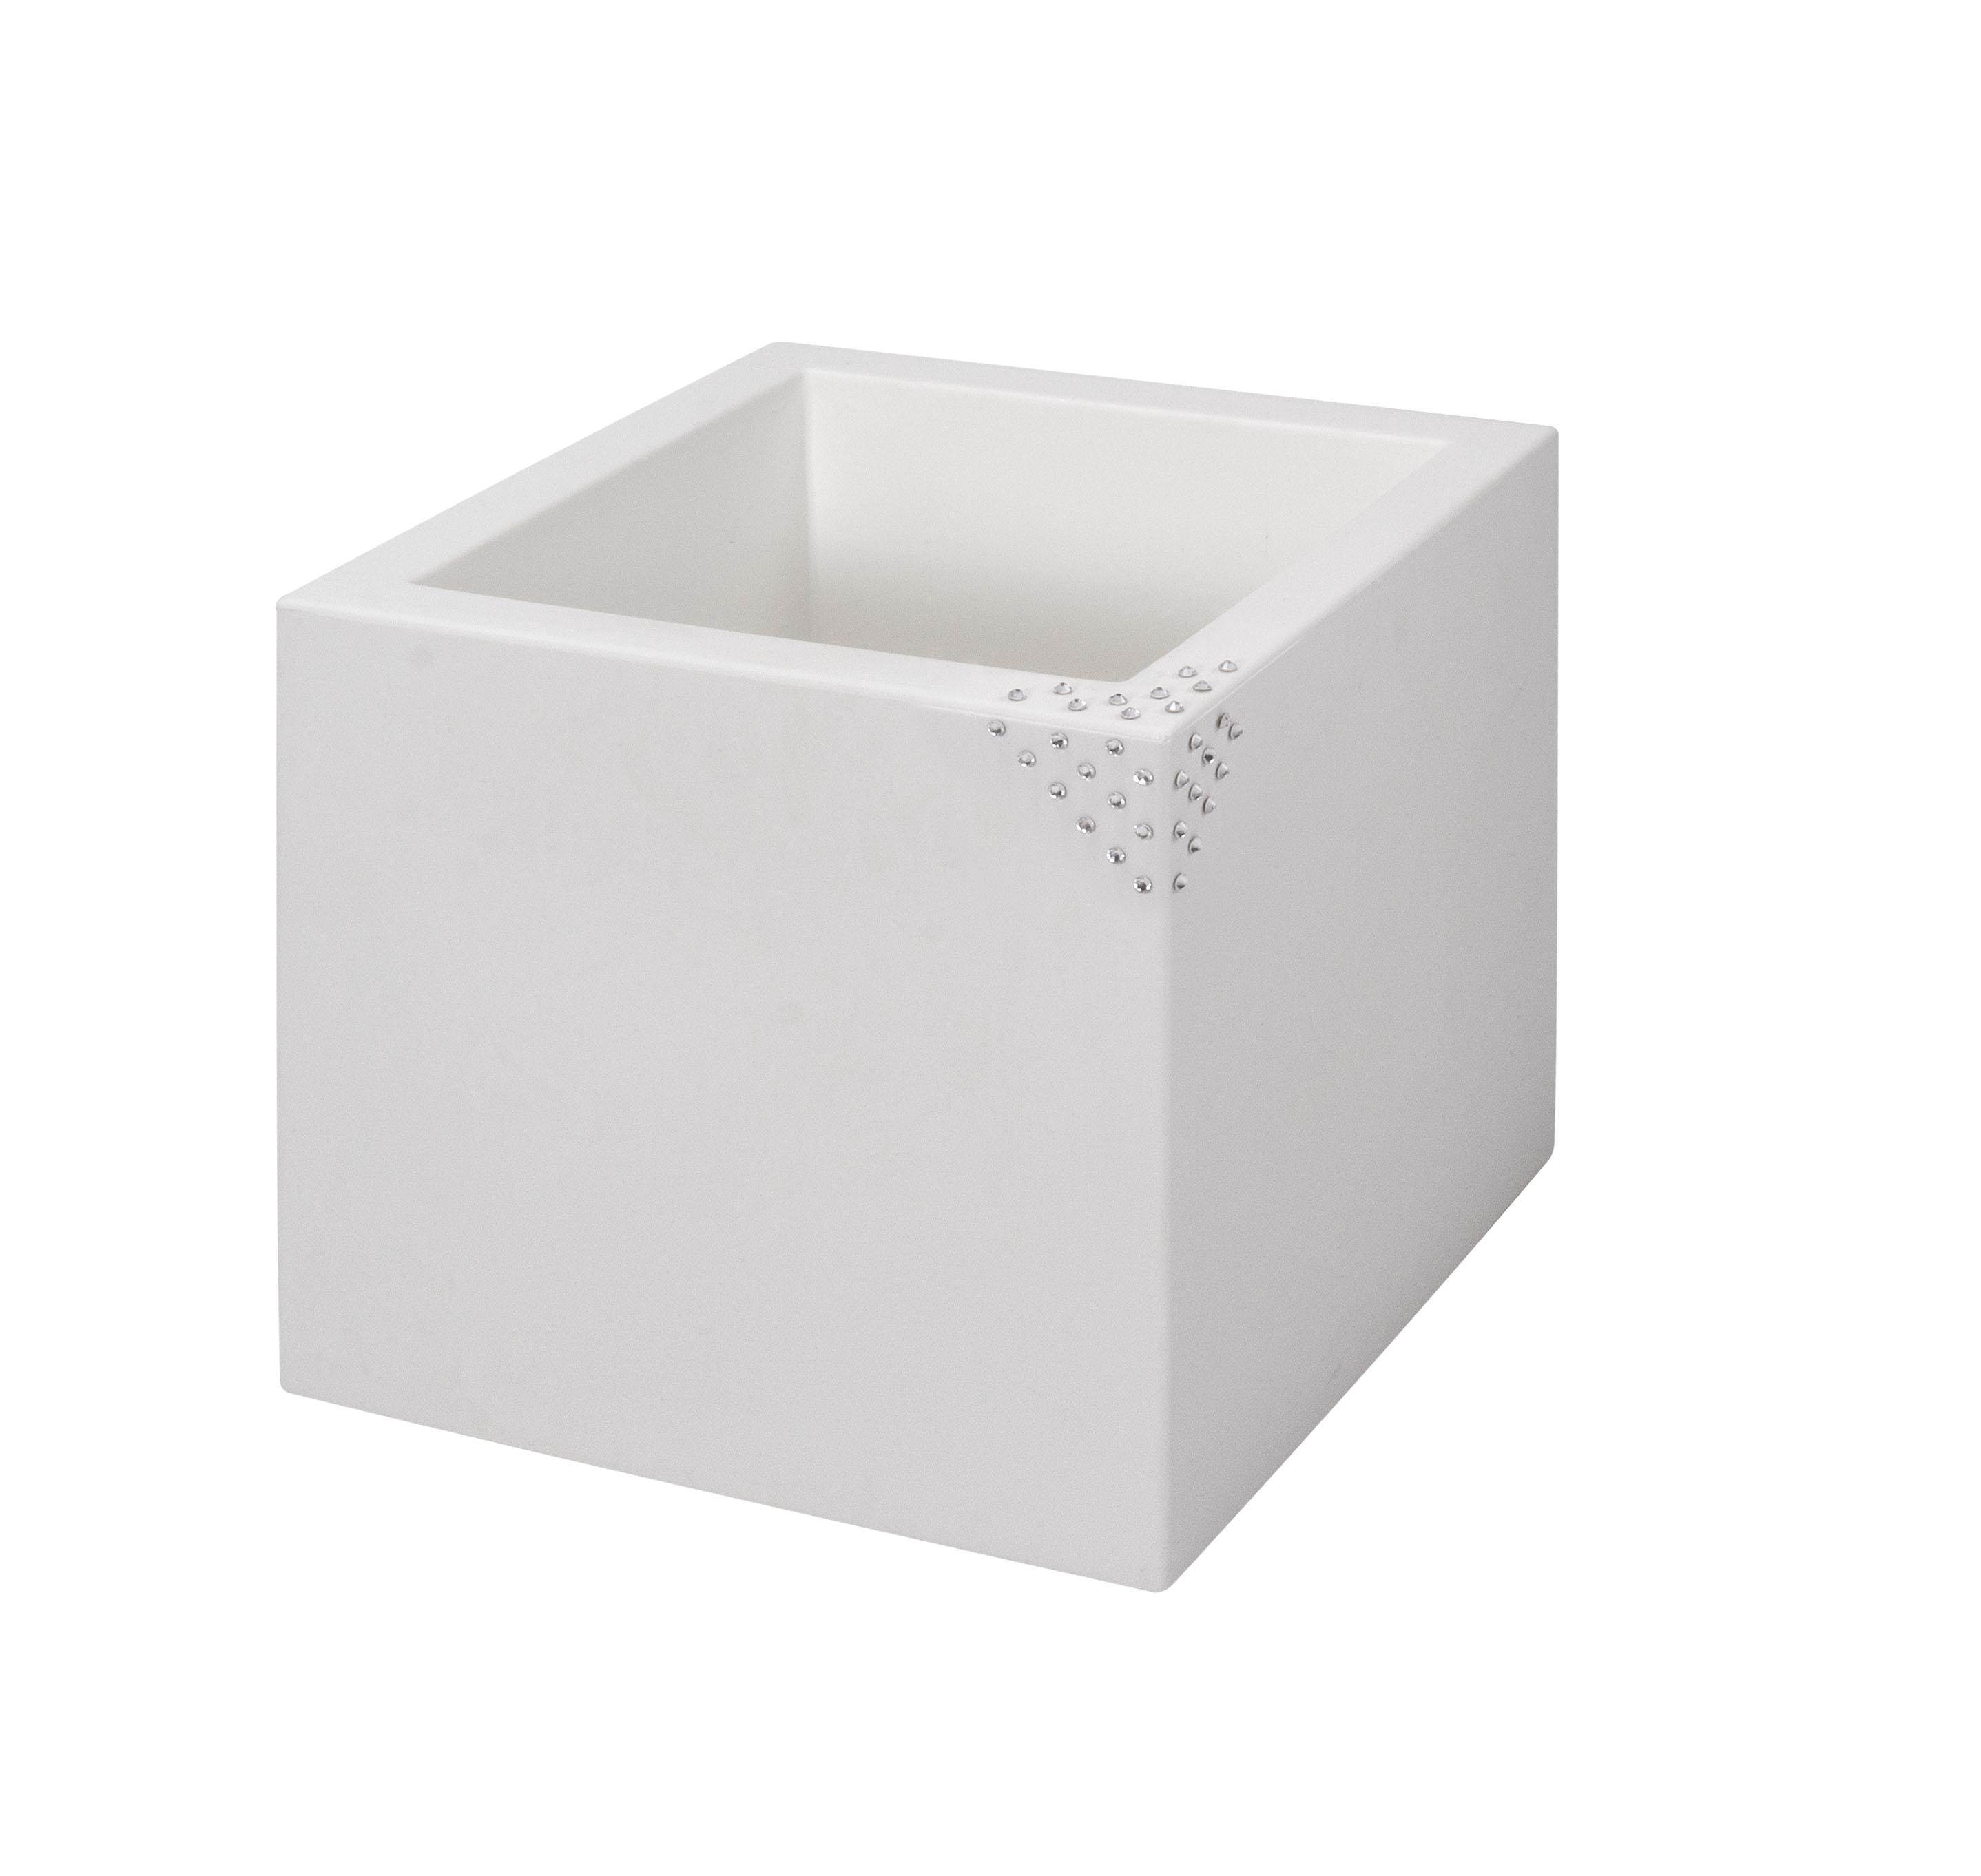 blumentopf pflanztopf nicoli modus quadro mit original swarovski kristallen motiv pyramid. Black Bedroom Furniture Sets. Home Design Ideas